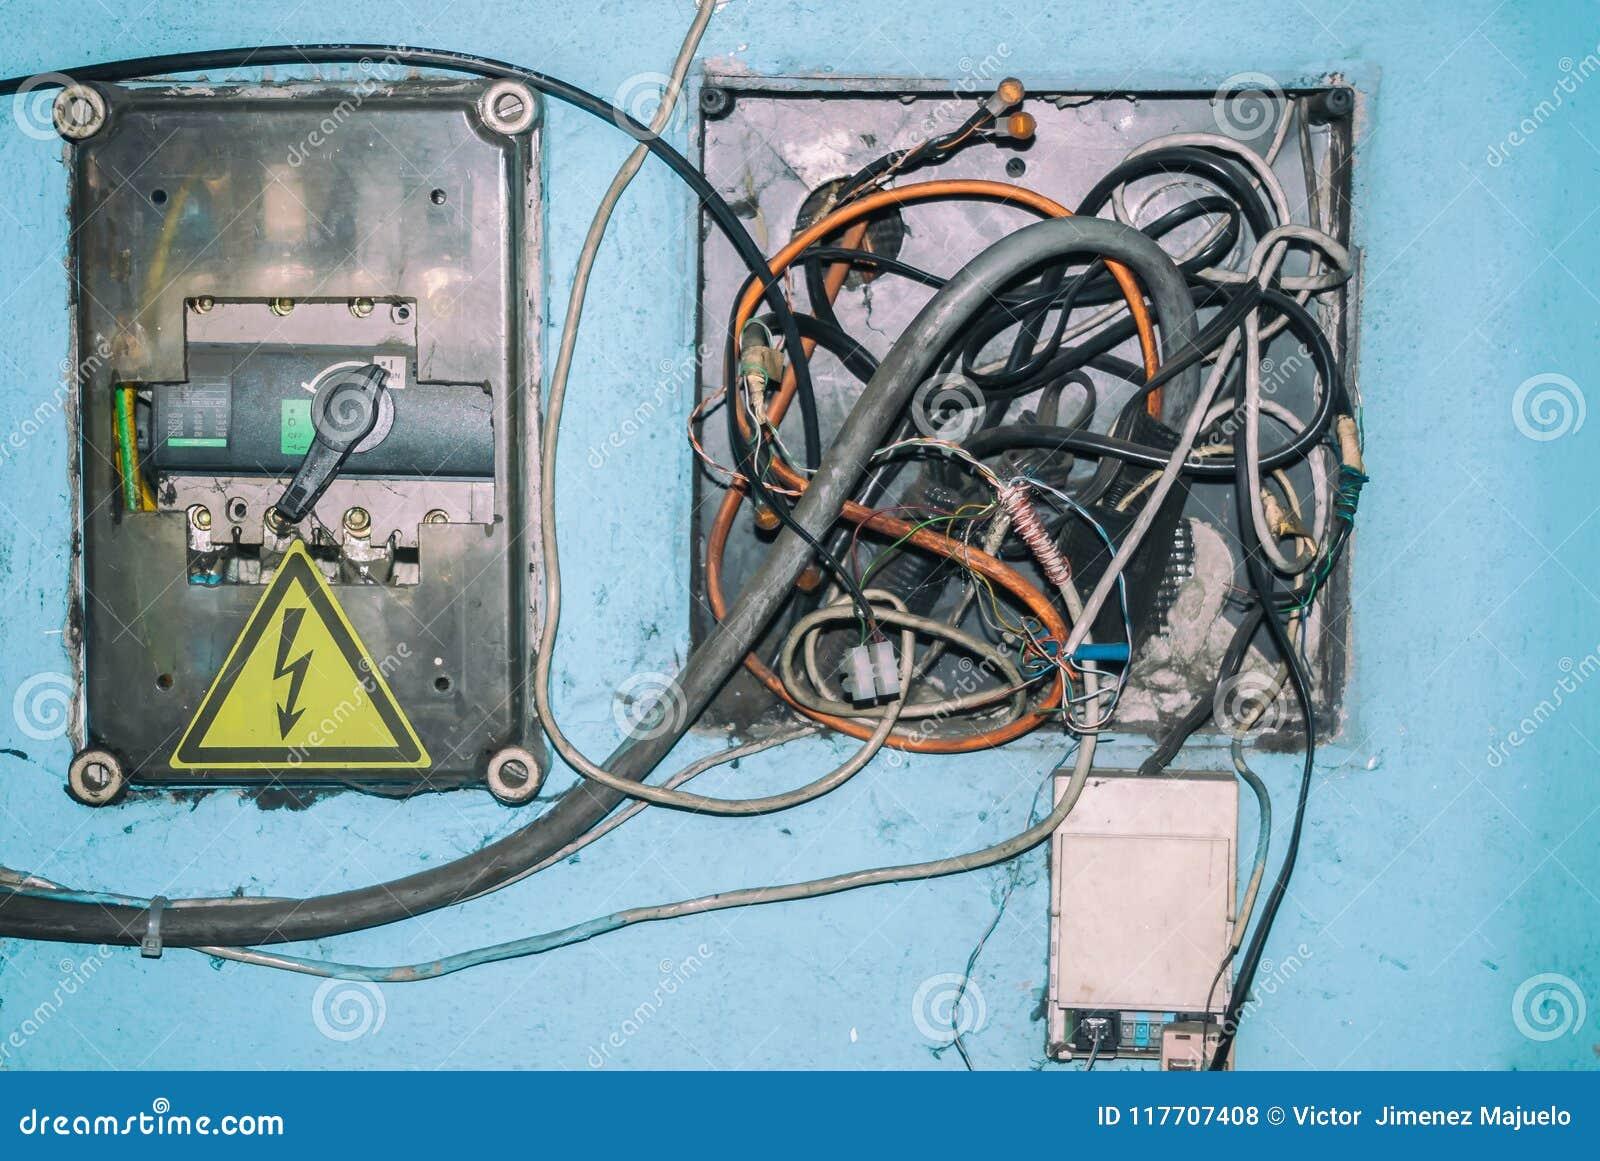 Wiring A Transformer Box - Data Wiring Diagrams •